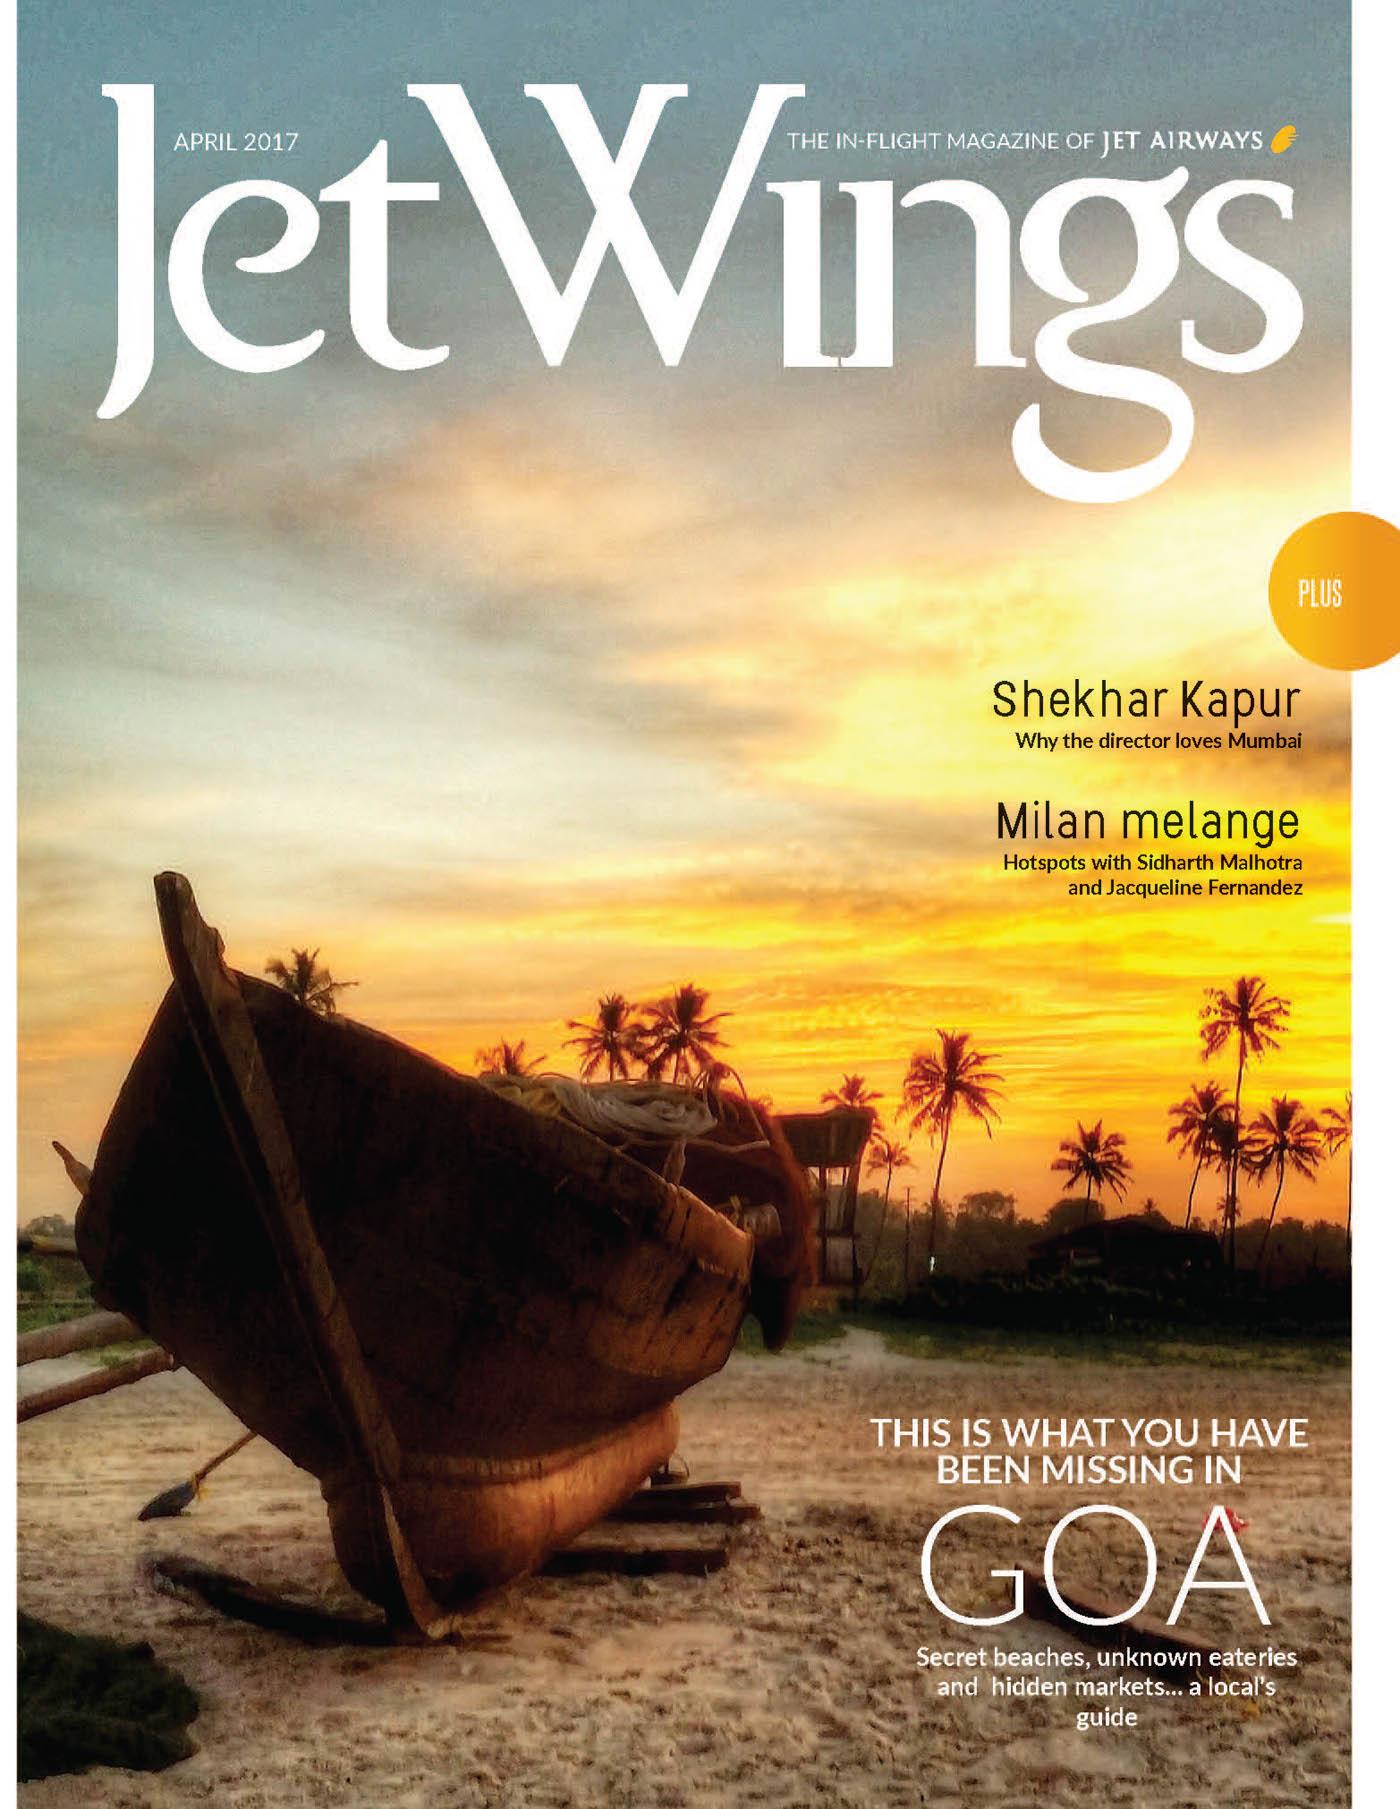 jetwings magazine